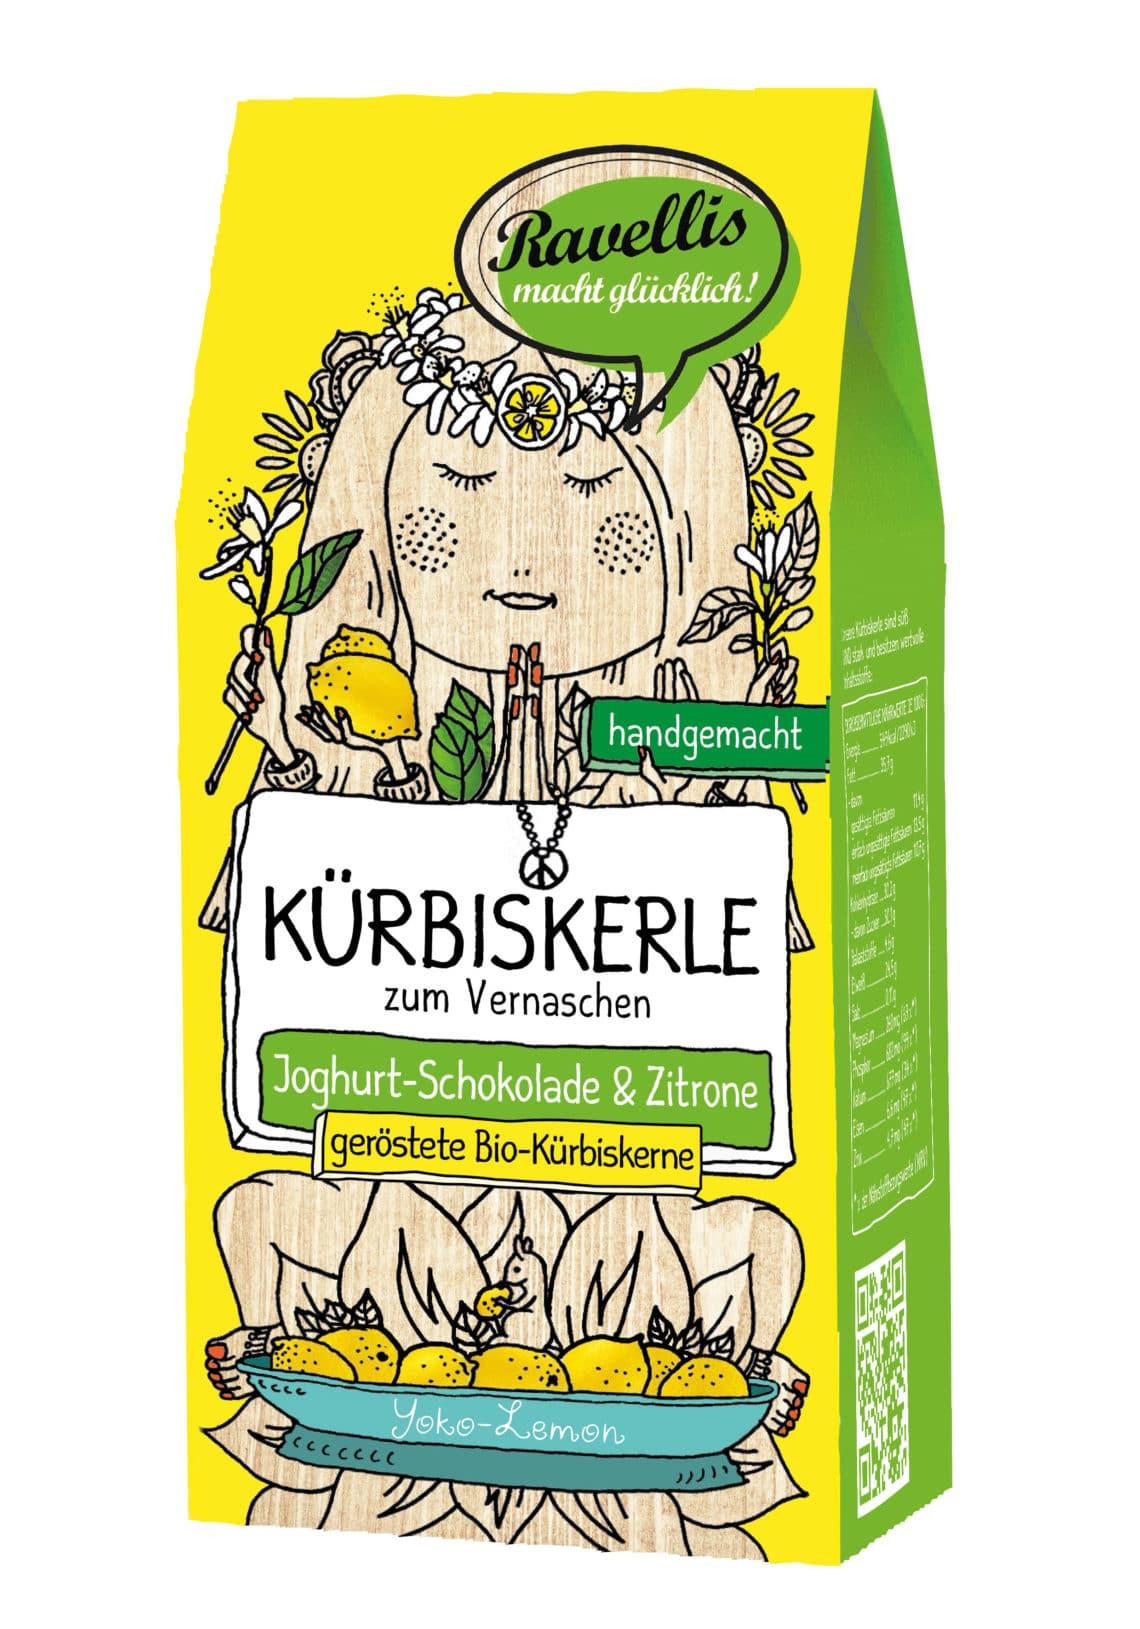 Joghurt-Schokolade & Zitrone